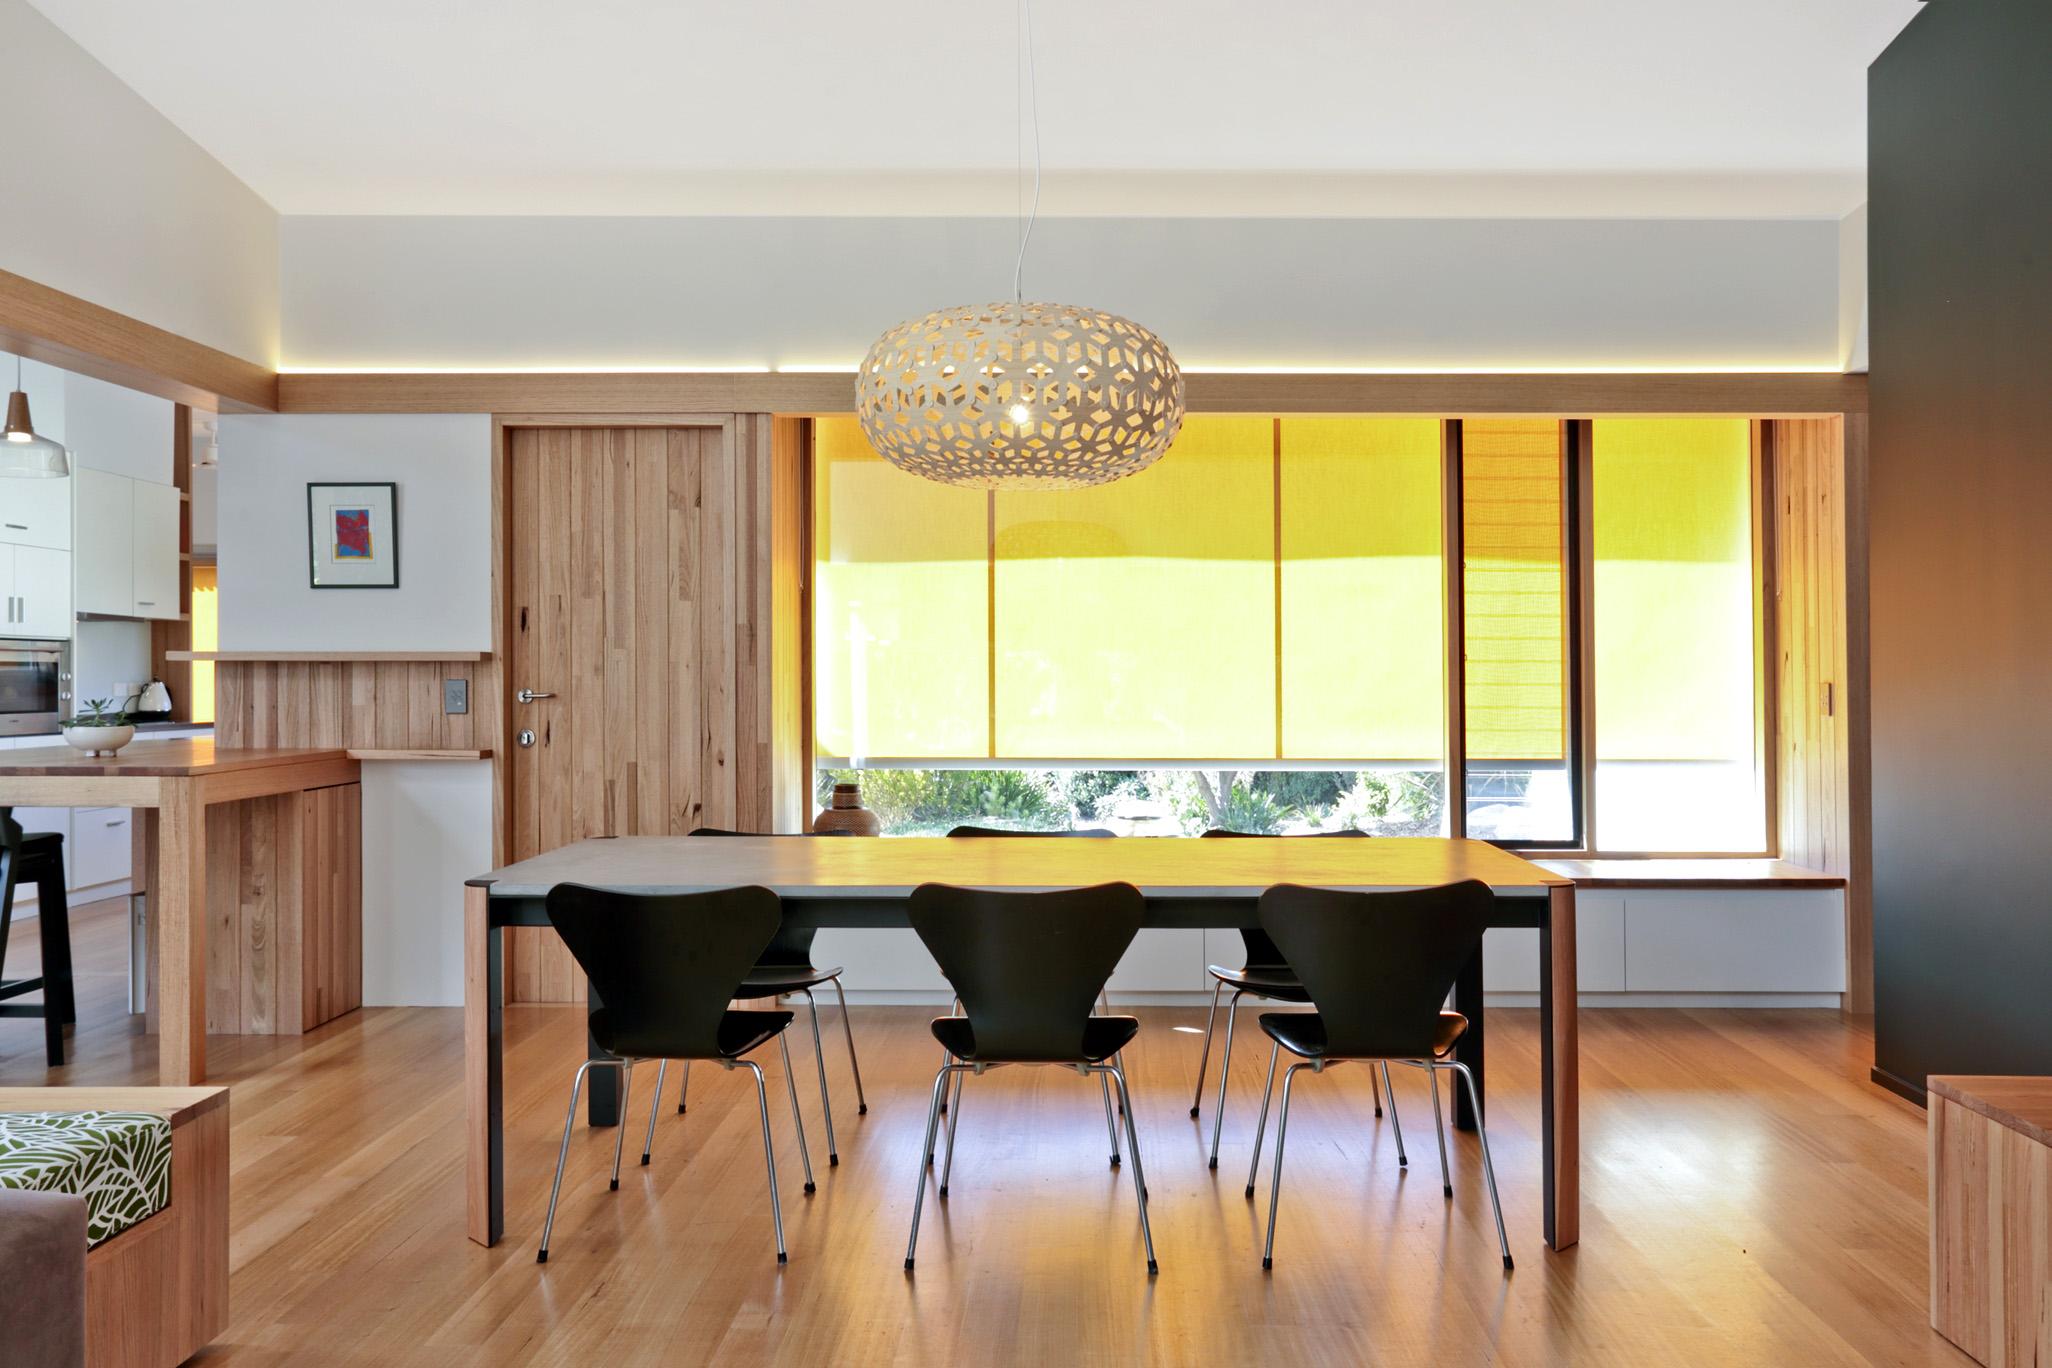 Anglesea house 6 interior-_01.jpg